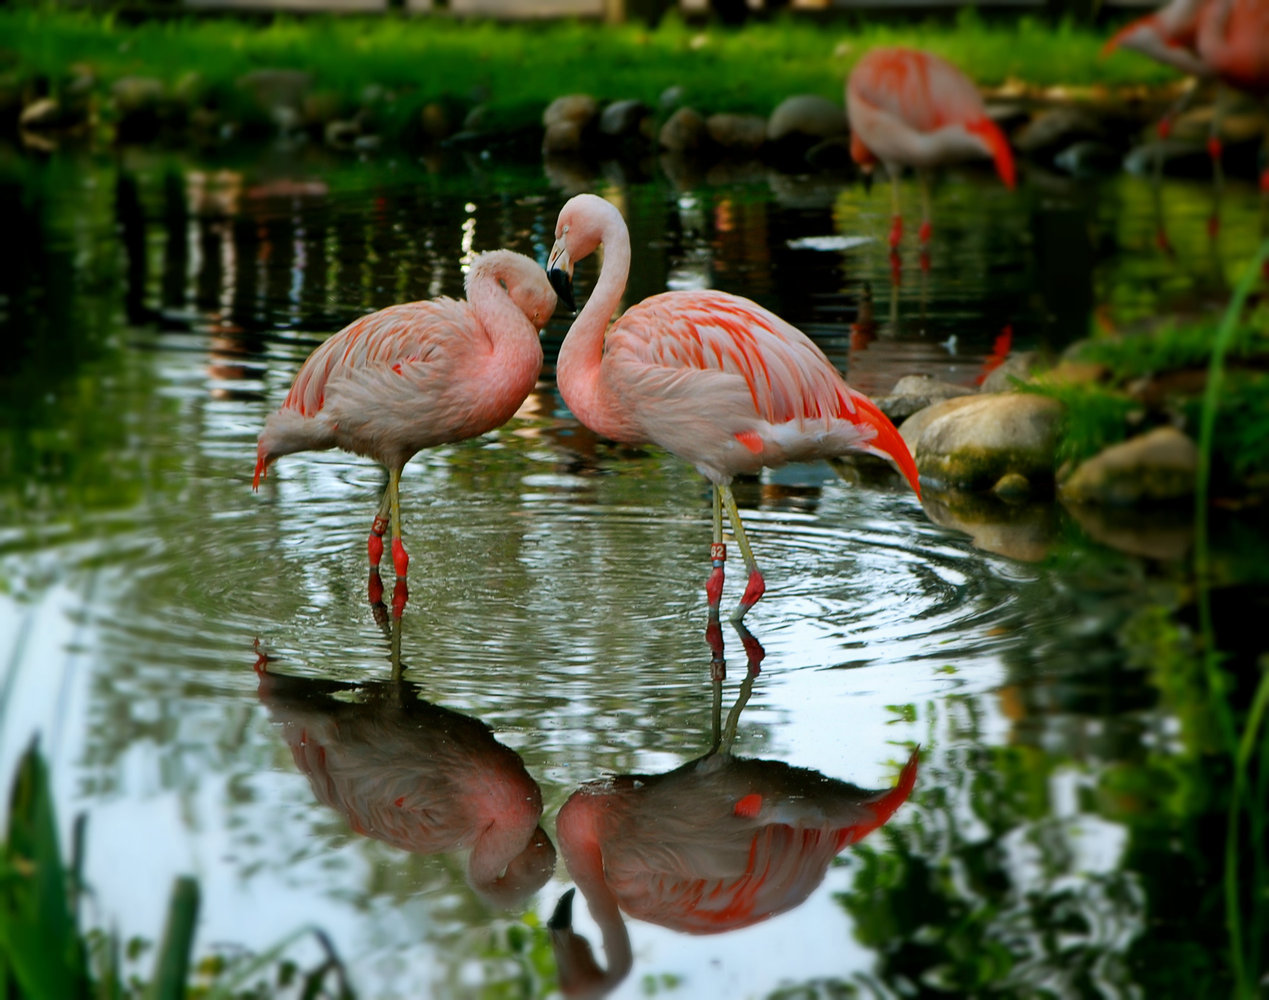 2012-09-08-rsz_flamingos1.jpg